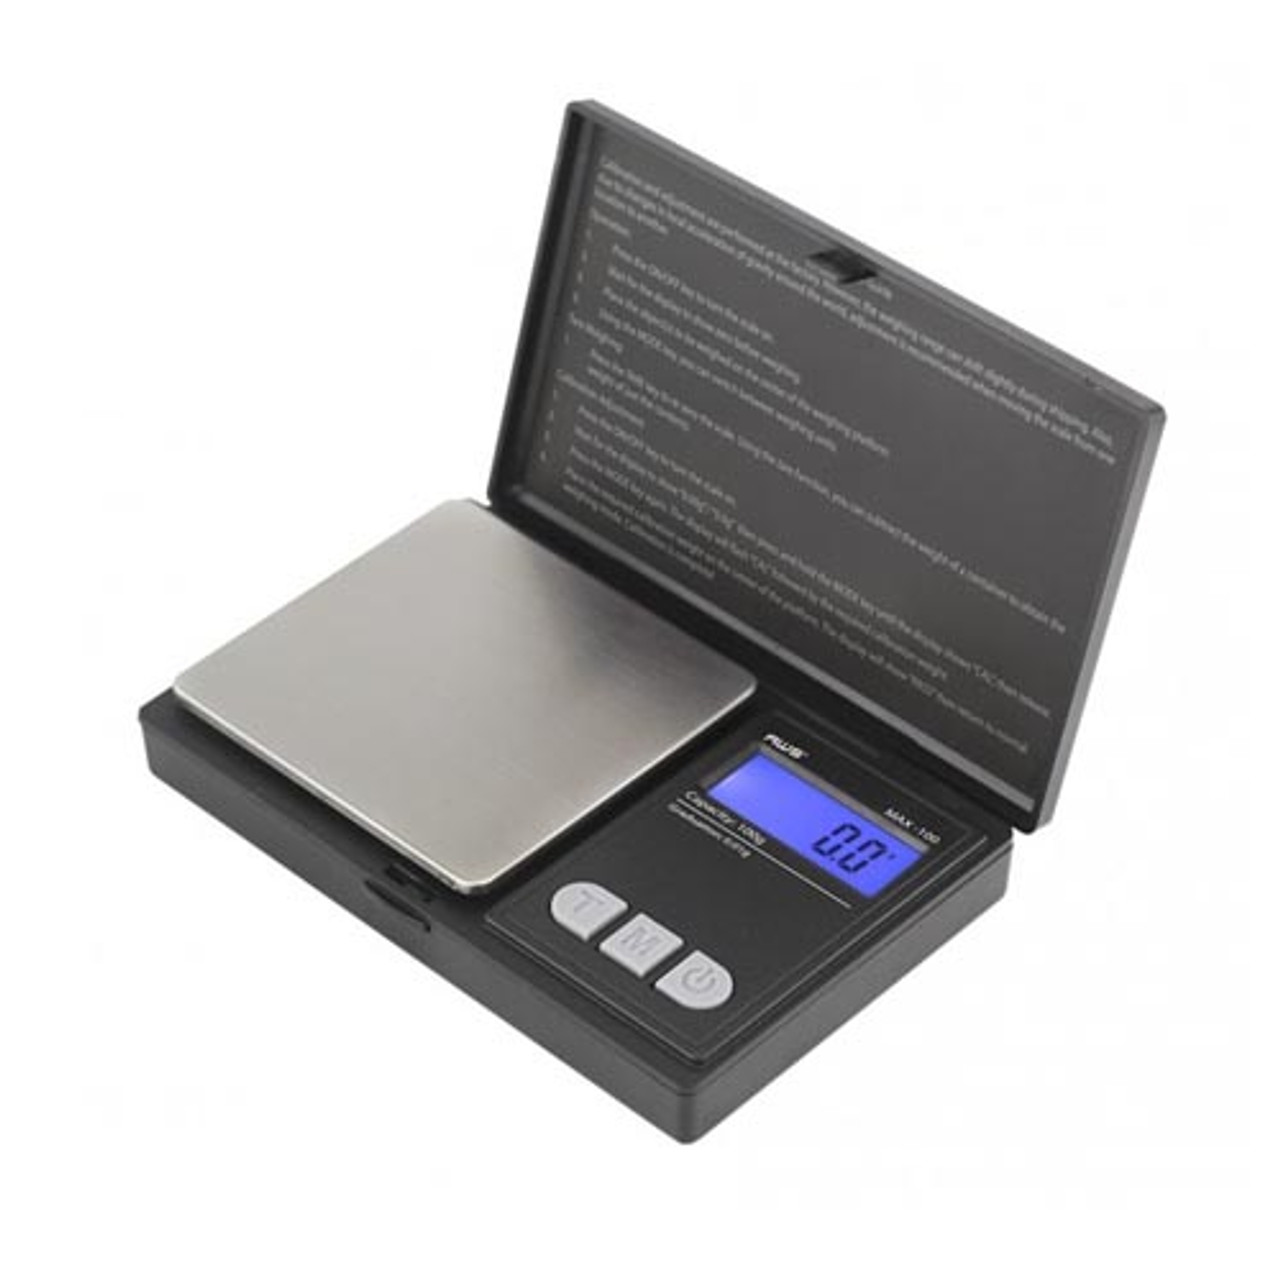 AWS Digital Scale MAX-100 (100g x 0.01g) Flip-Open Cover - Black